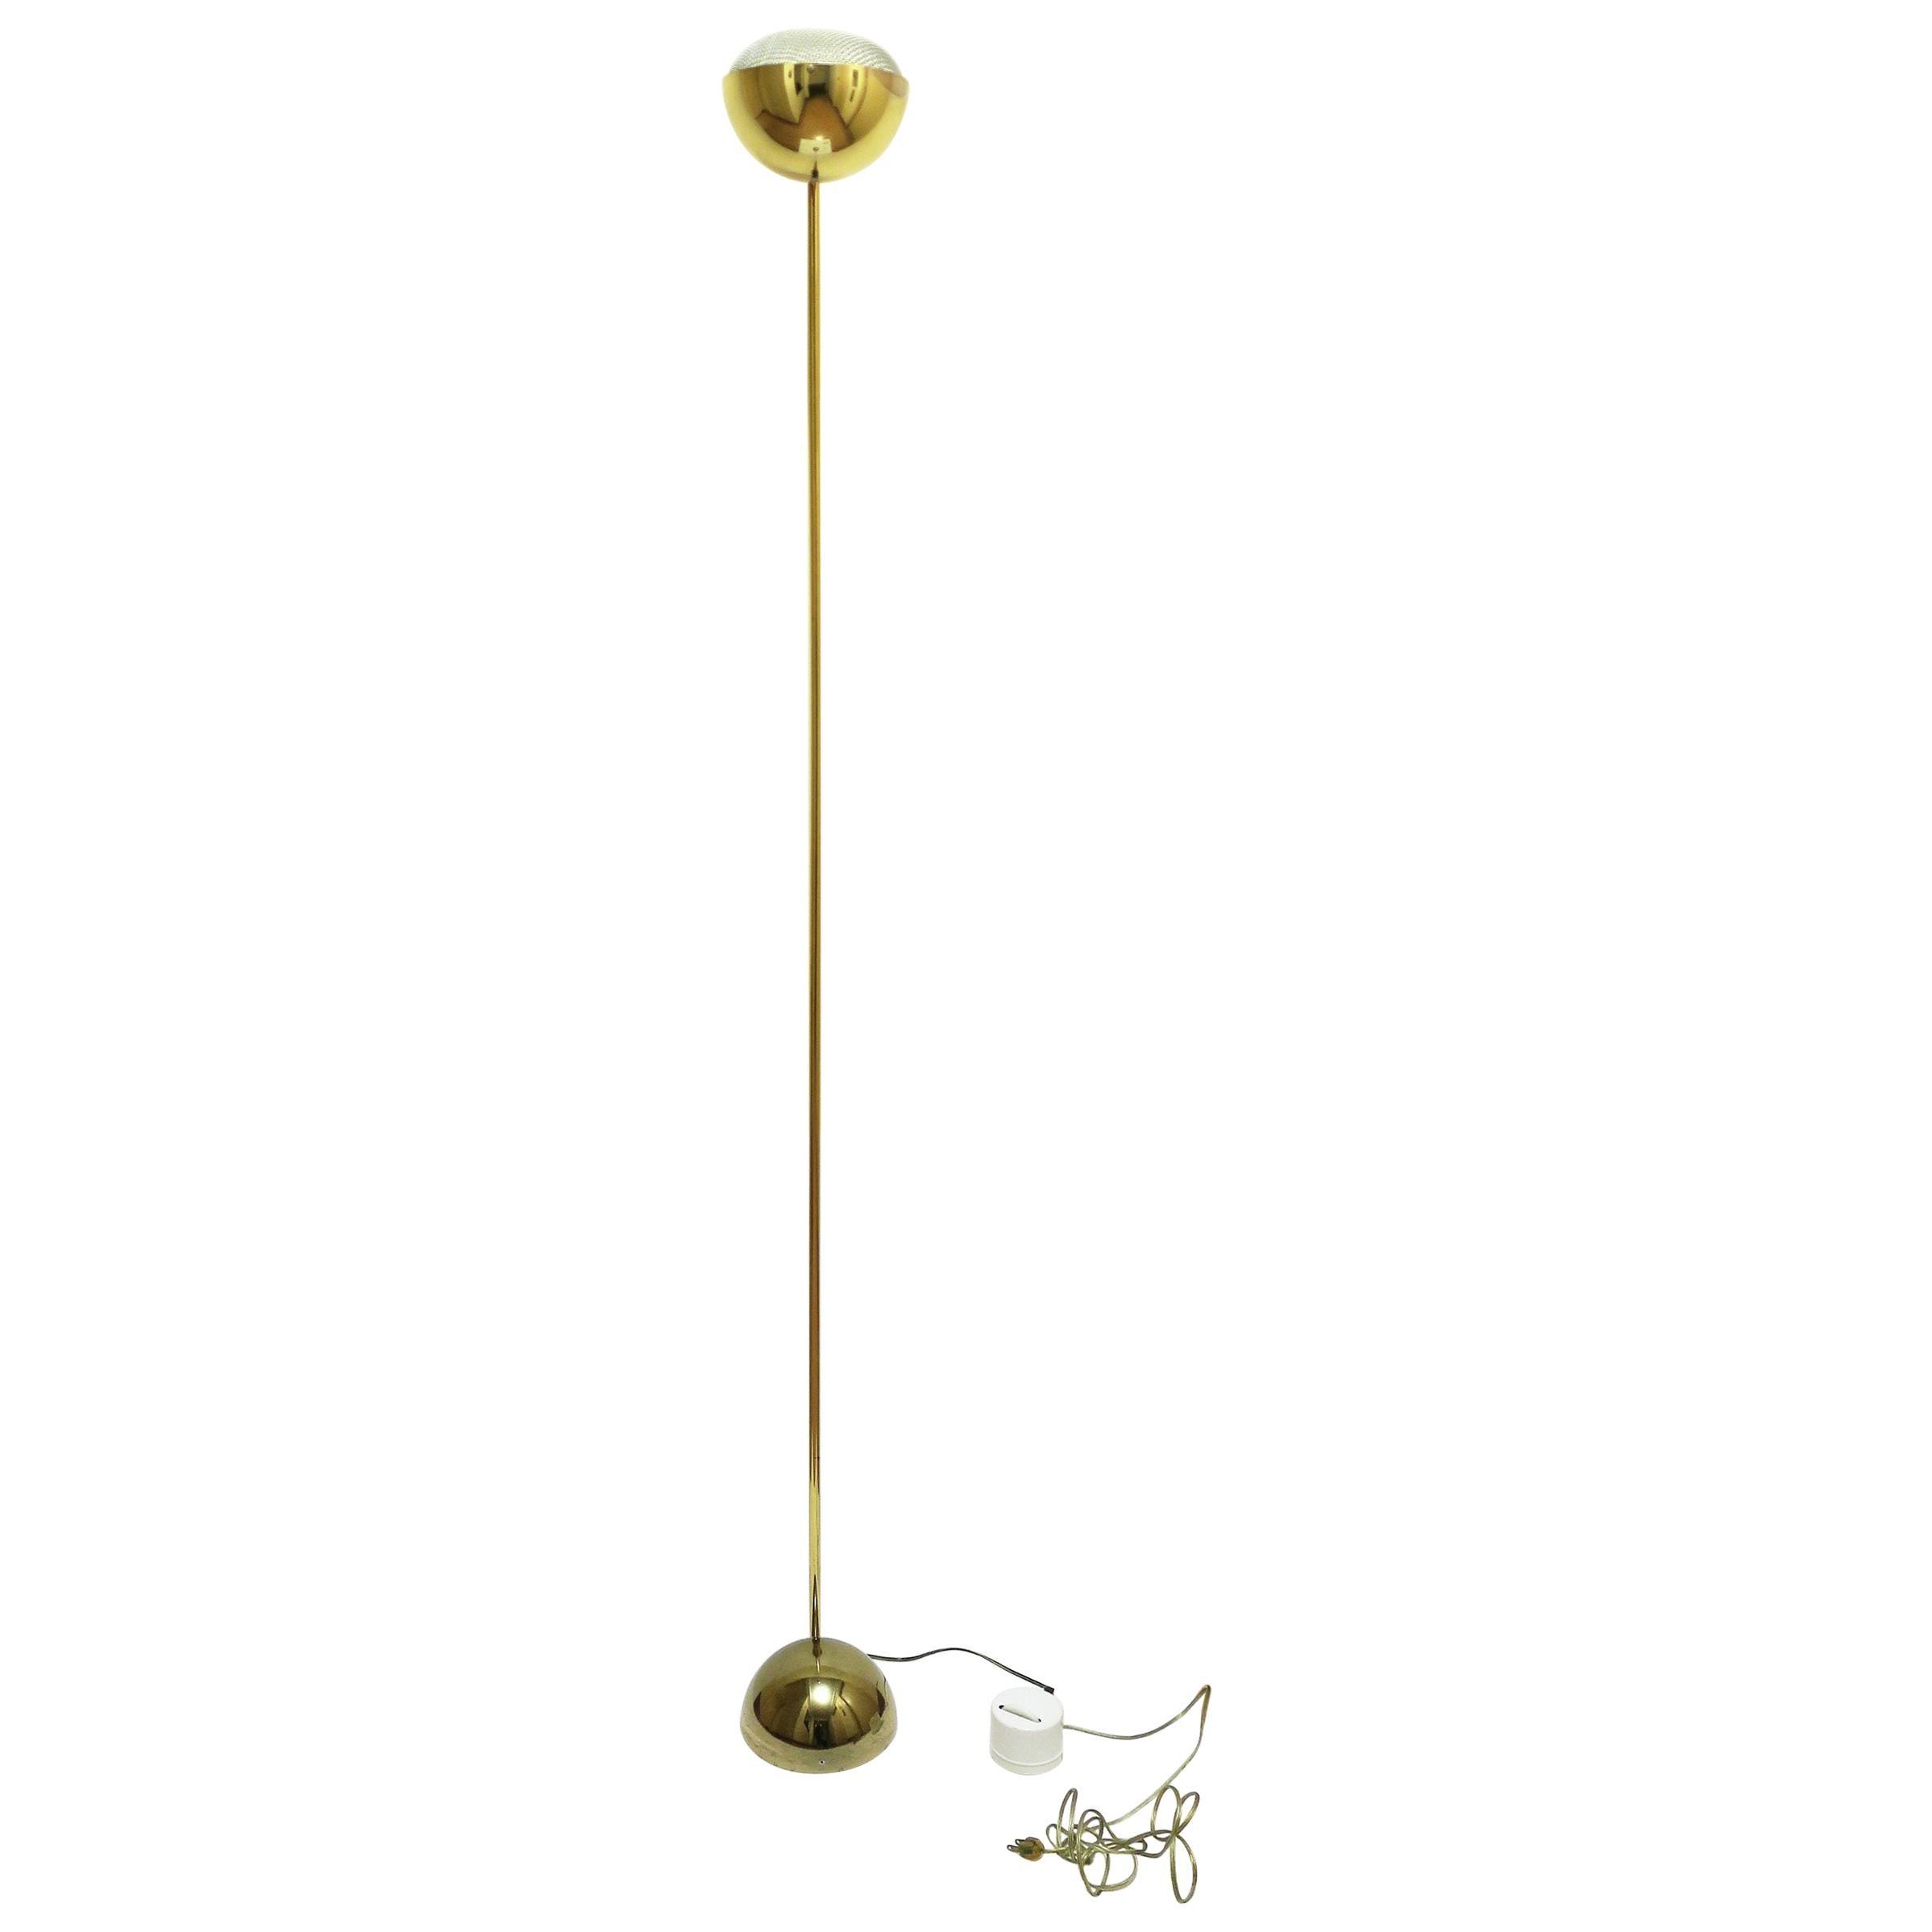 1970s Modern Brass Floor Lamp